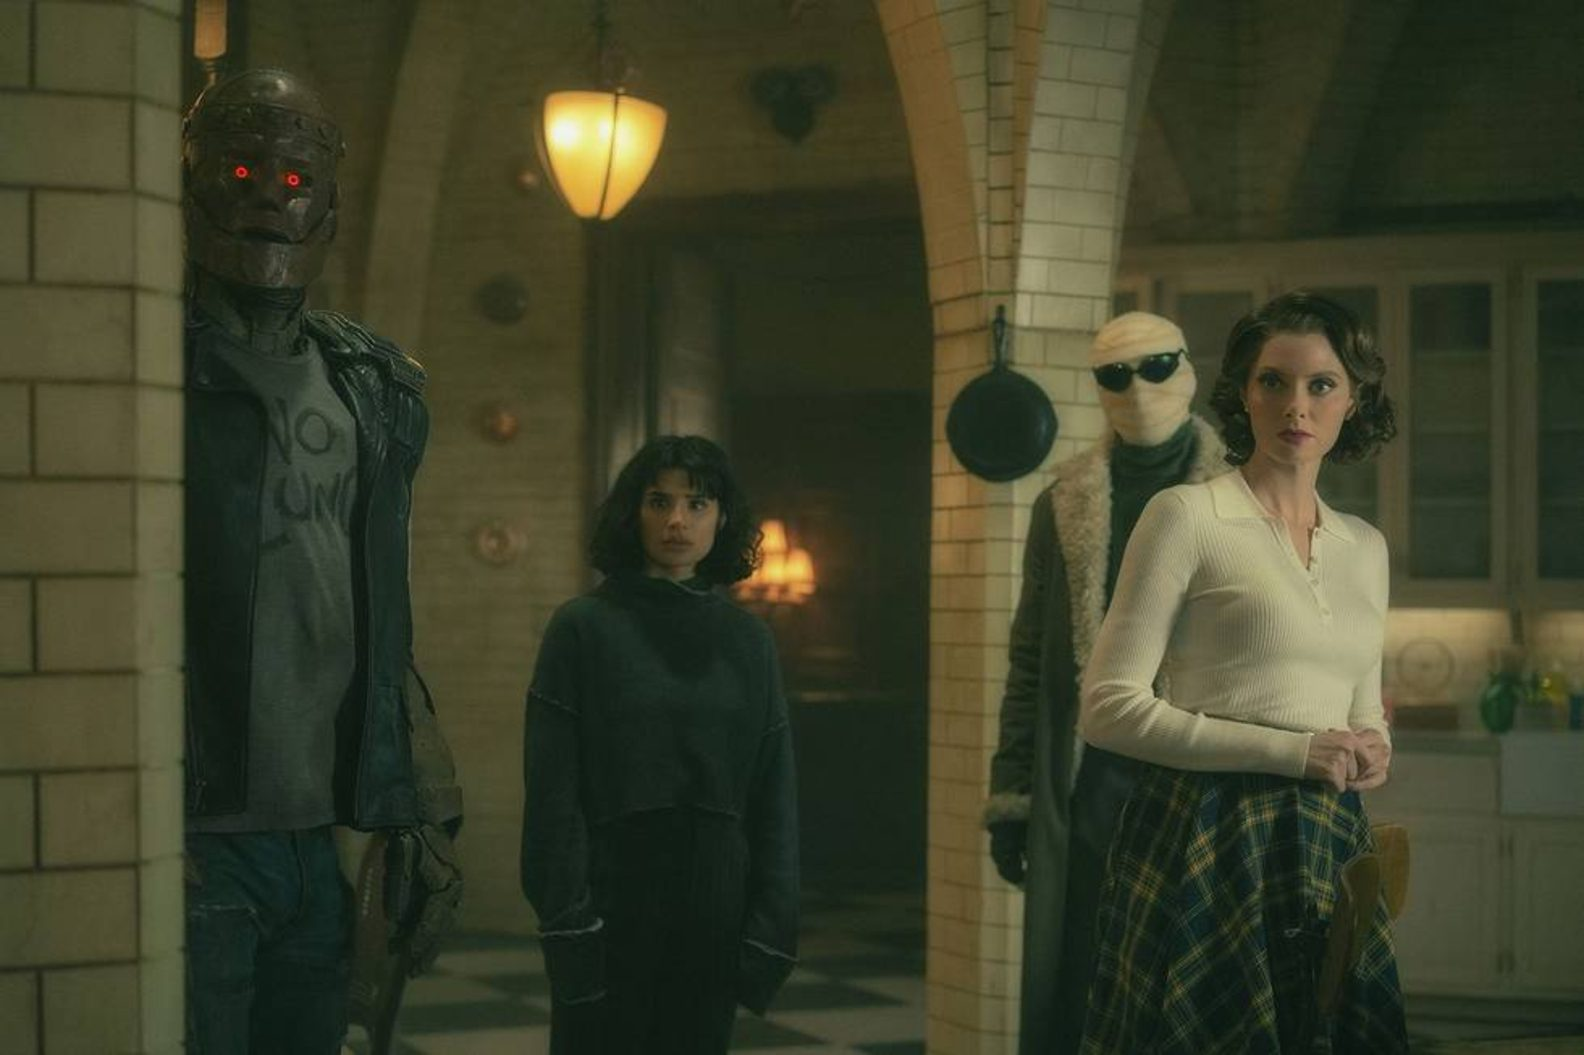 Doom Patrol Season 3 Episode 6